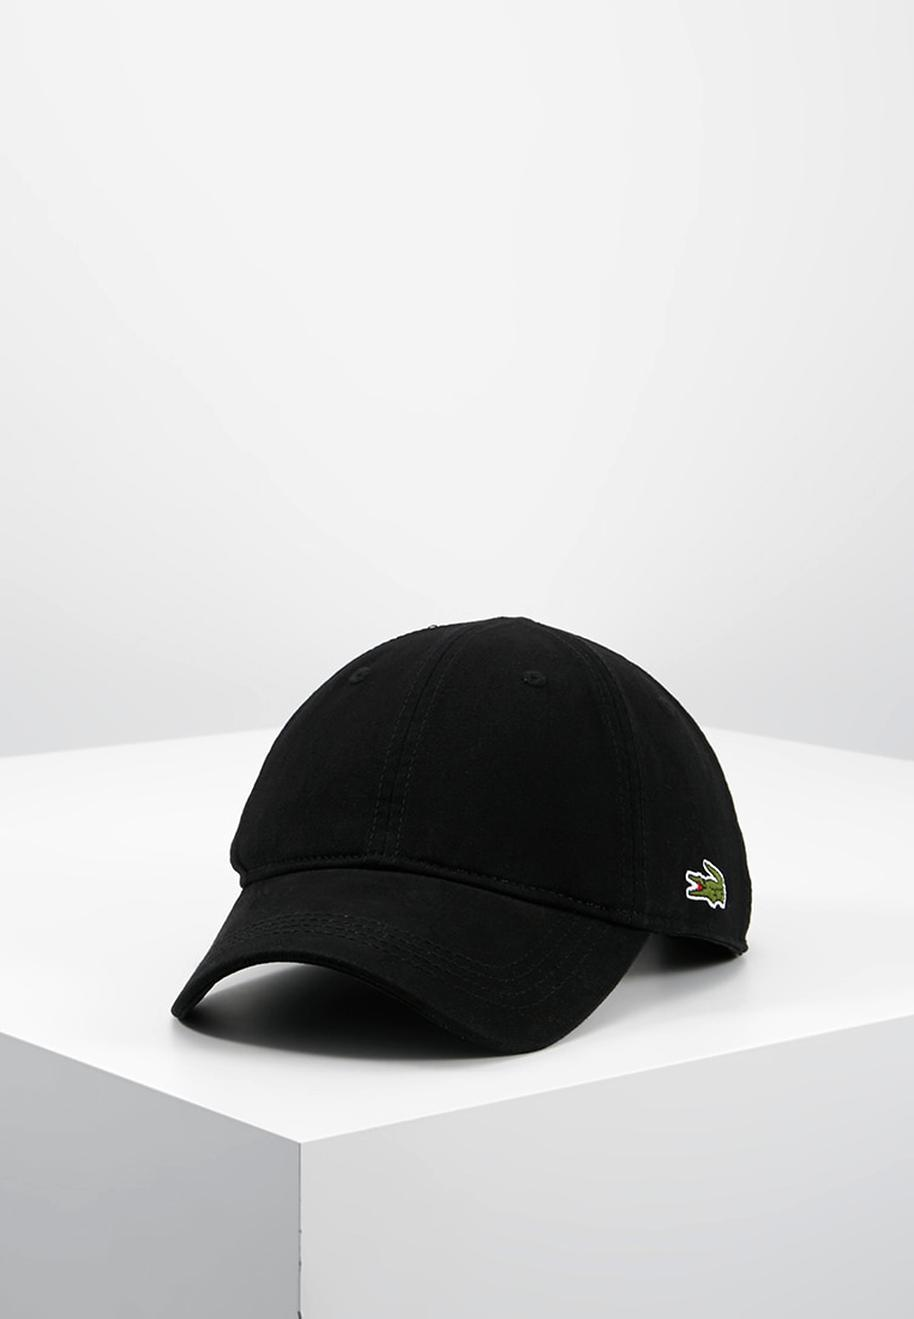 casquette lacoste casquette d'occasion